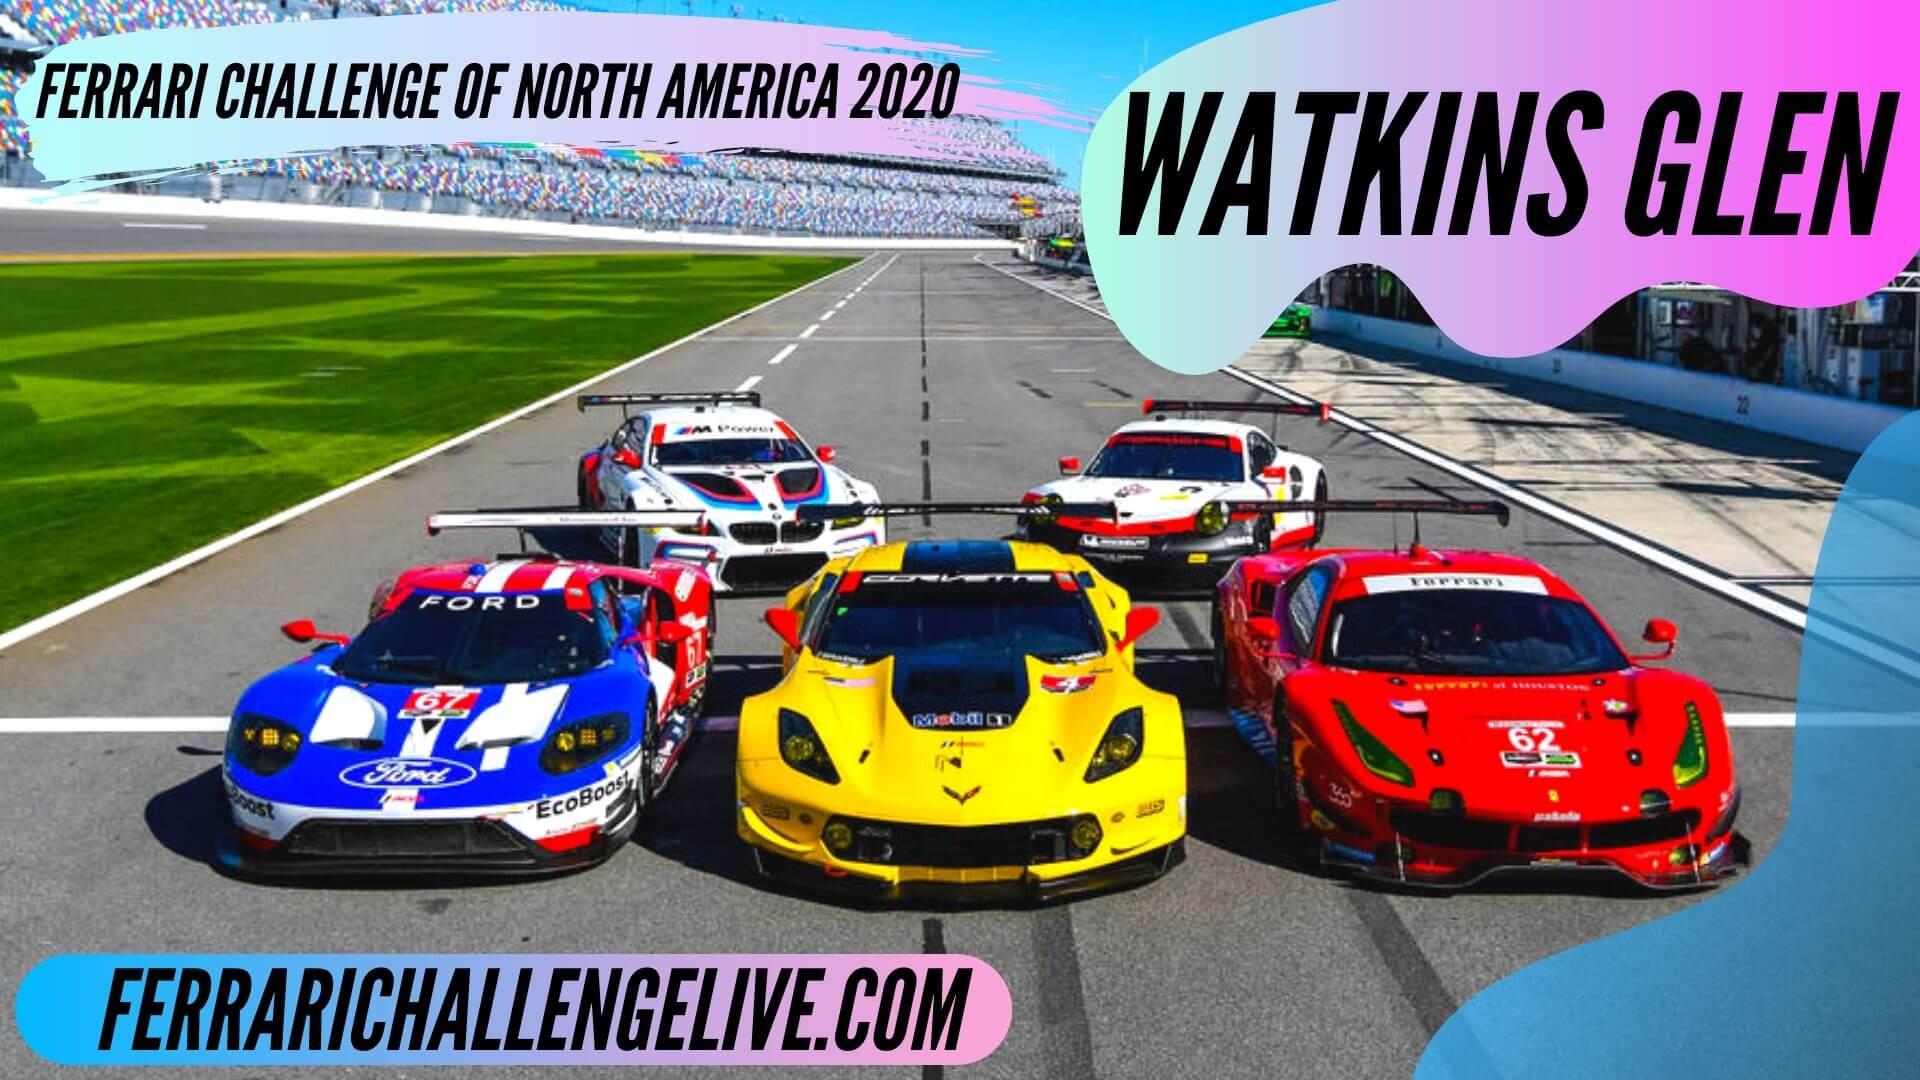 Watkins Glen Live Stream 2020 | Ferrari Challenge North America